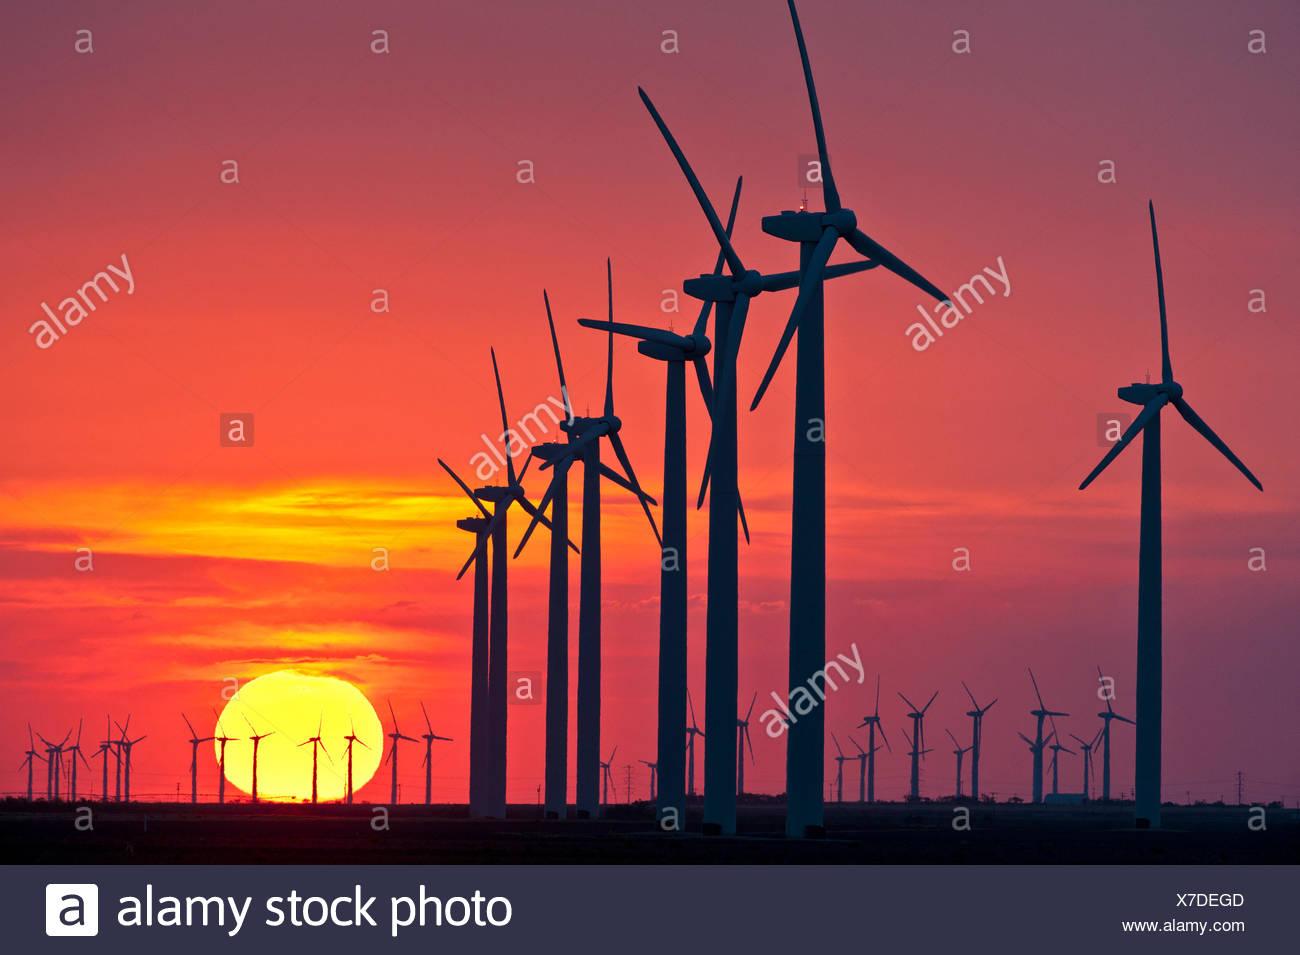 Wind Turbines at sunset. - Stock Image